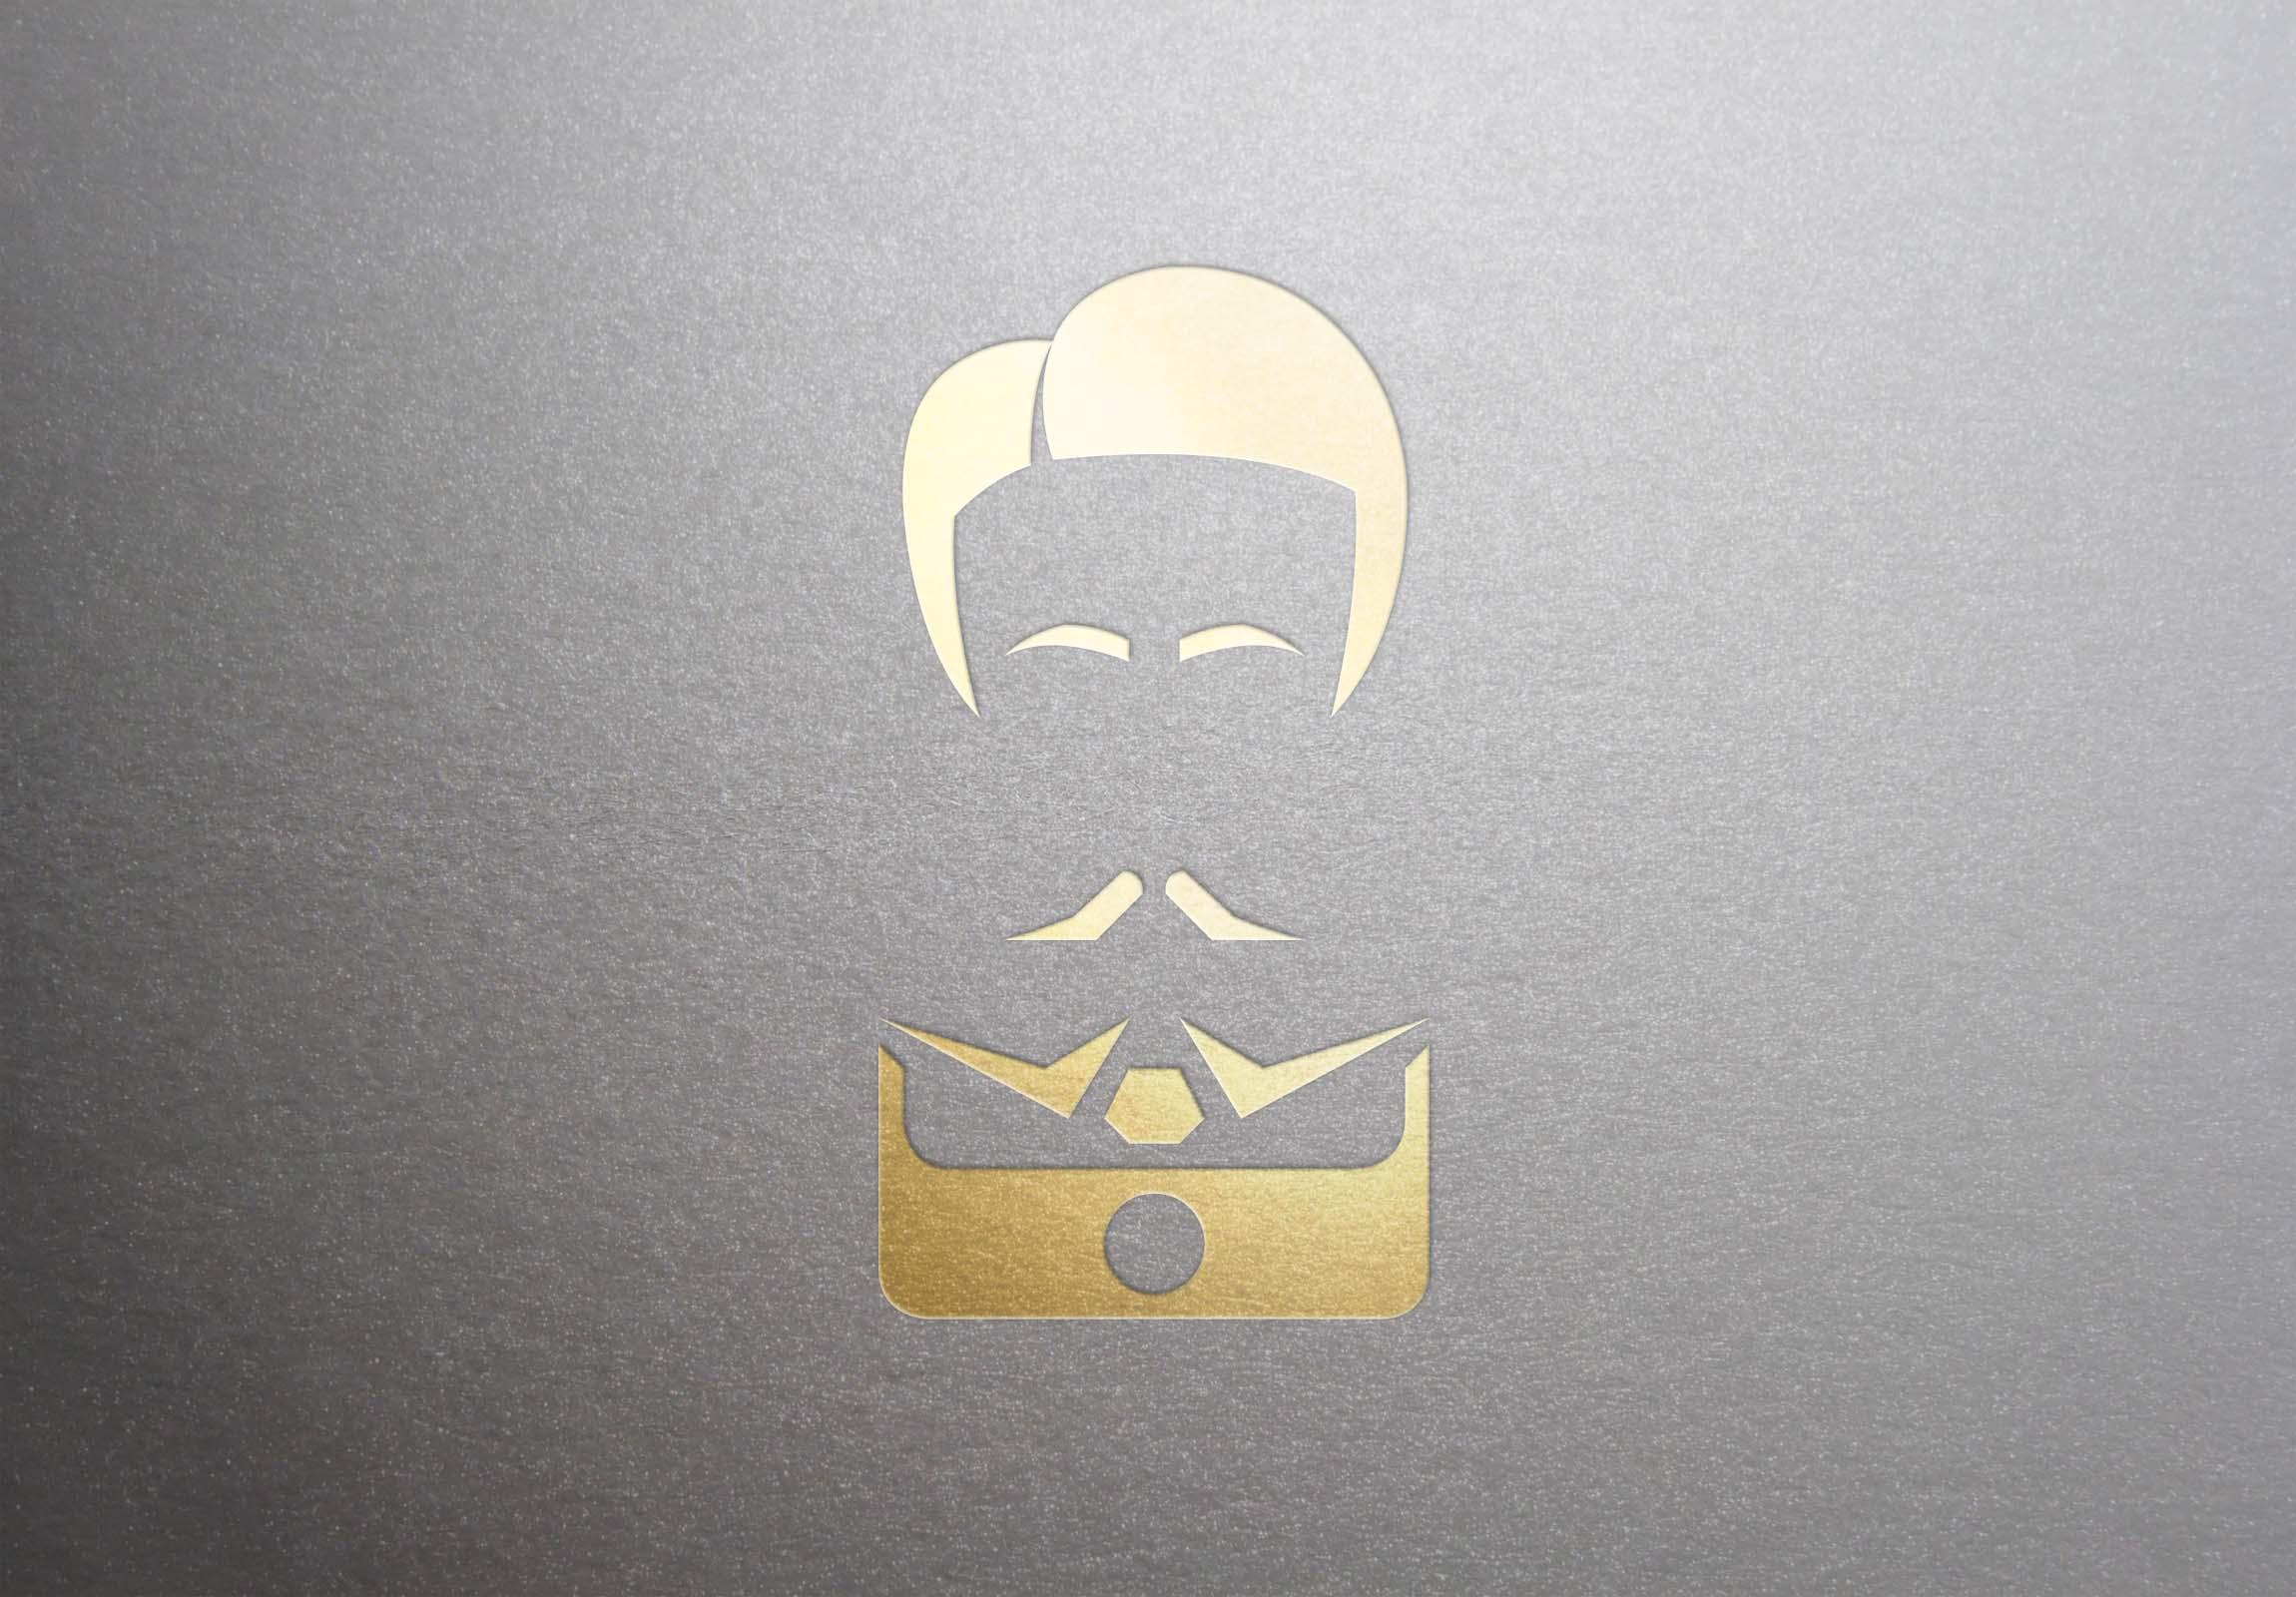 Разработка Логотипа 6 000 руб. фото f_15458f88de3c3807.jpg